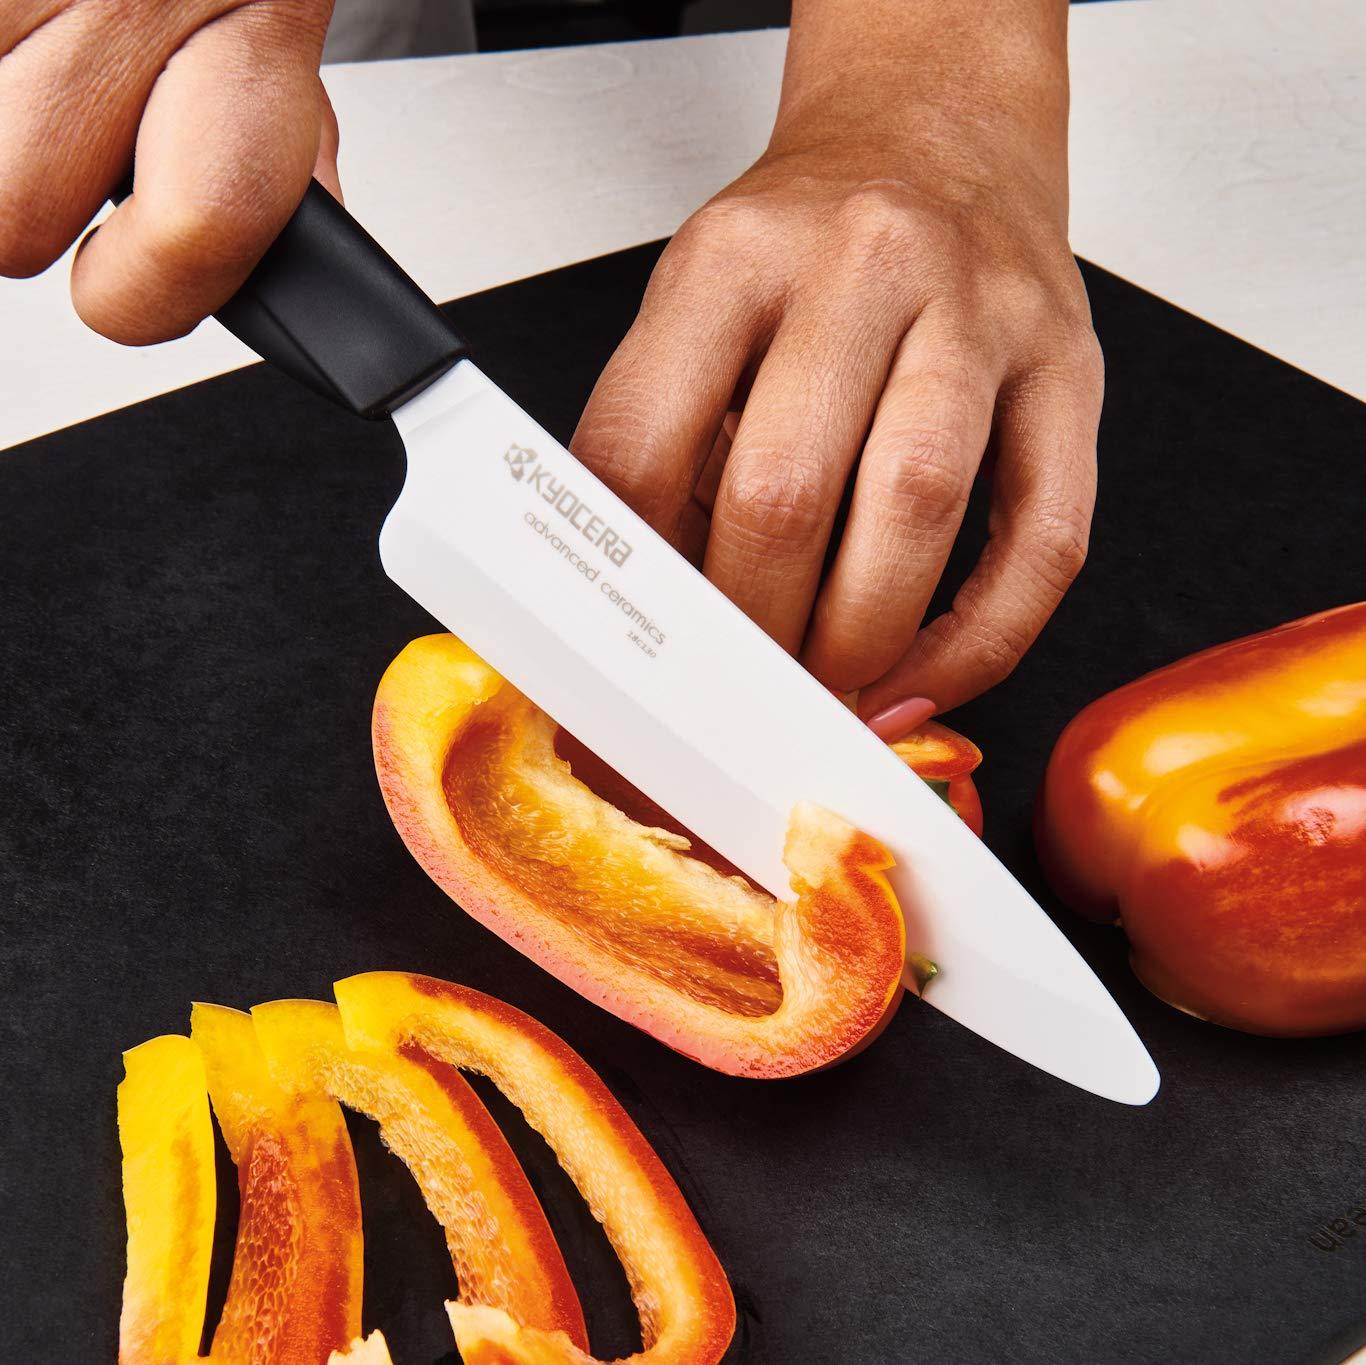 Kyocera FZ-4PC WH-BK Innovation Series Ceramic Knife, 7''/5.5''/5''/4.5'', WHITE by Kyocera (Image #7)